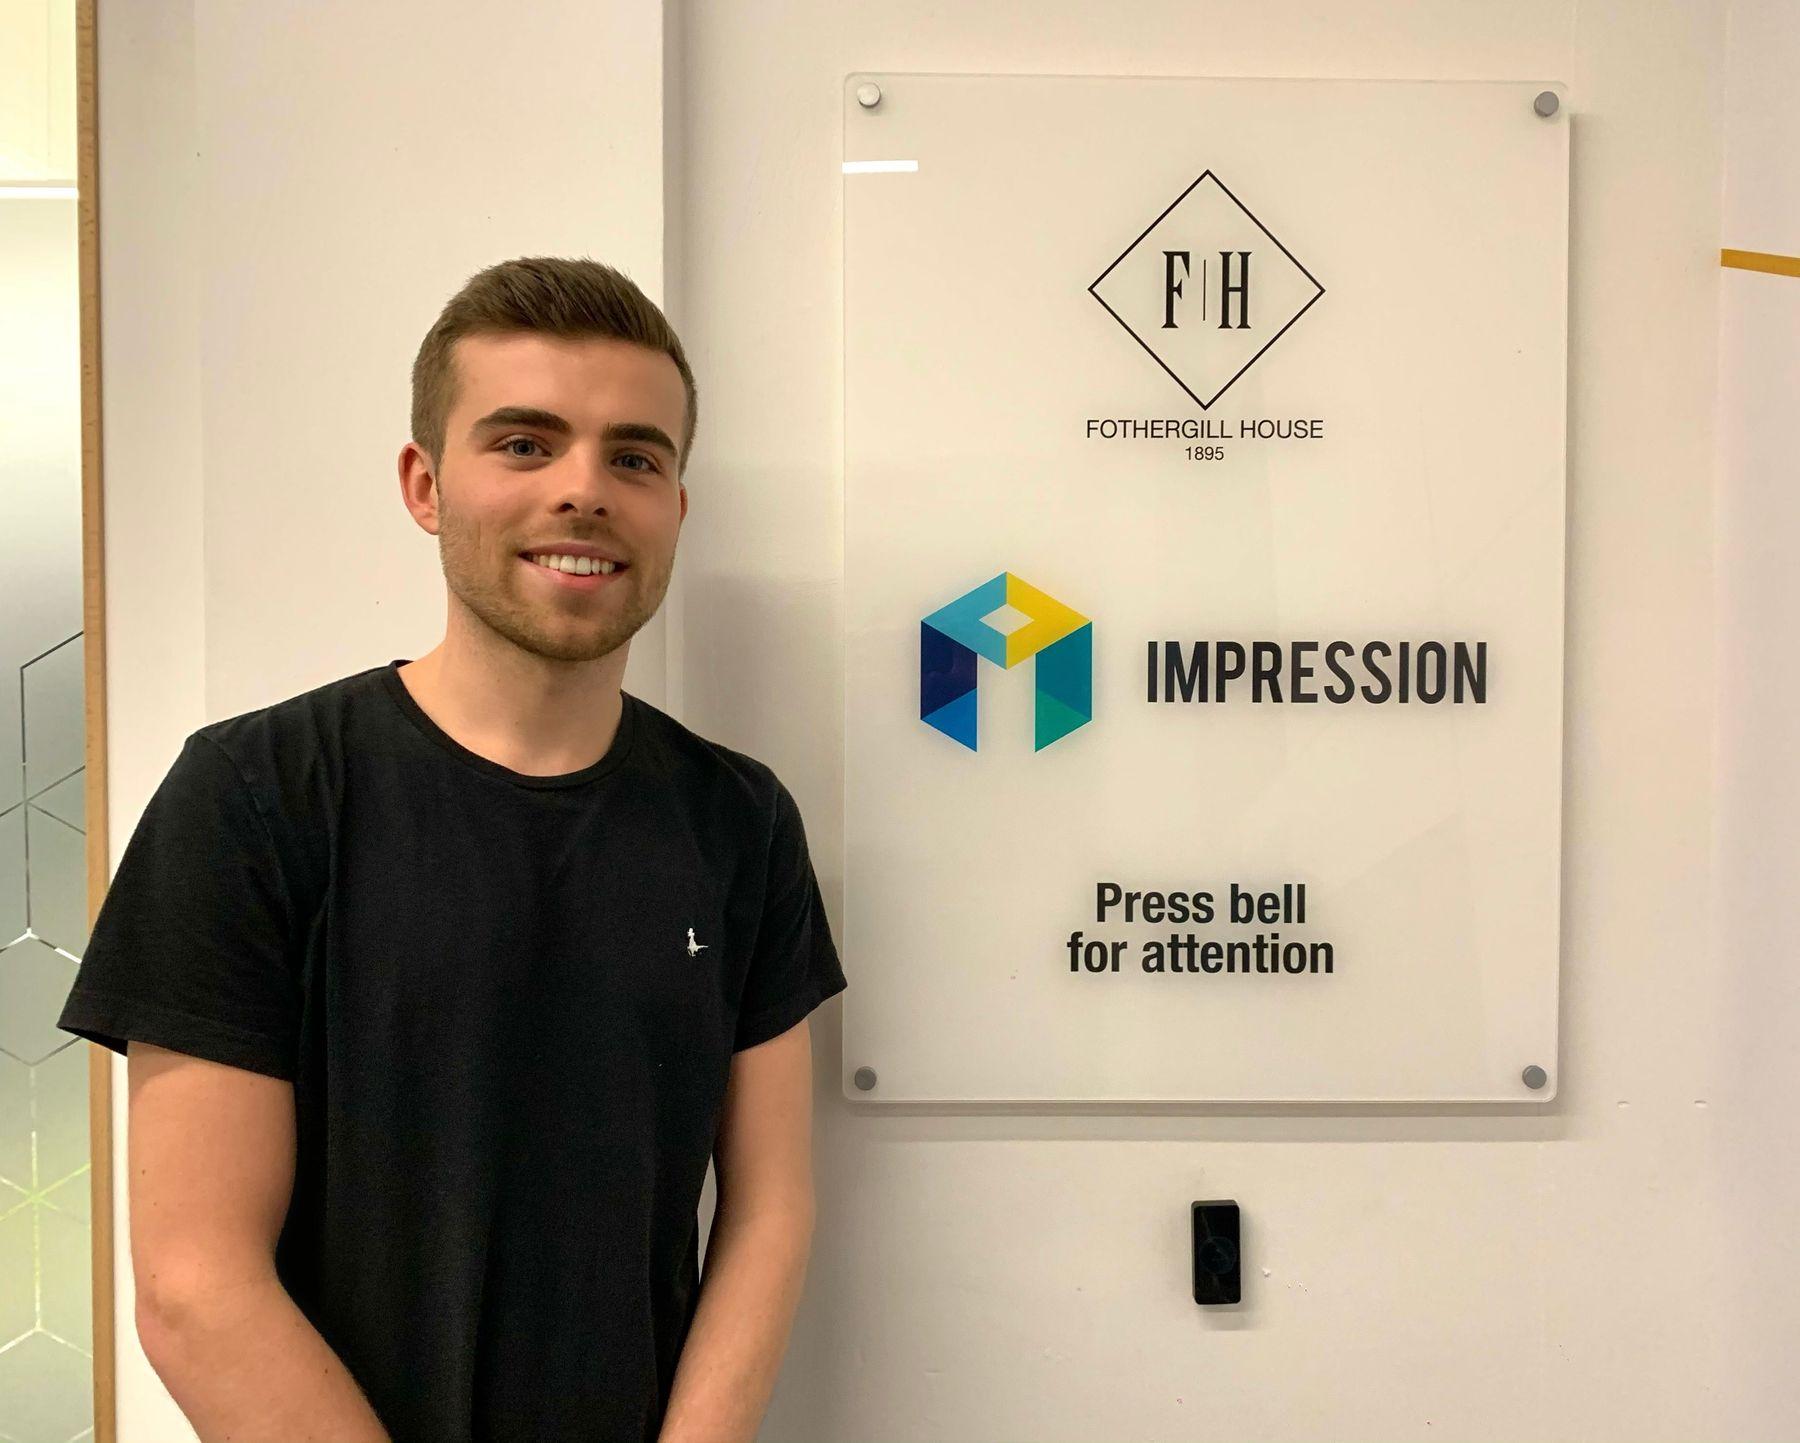 Reuben Hewitt with the Impression Digital sign